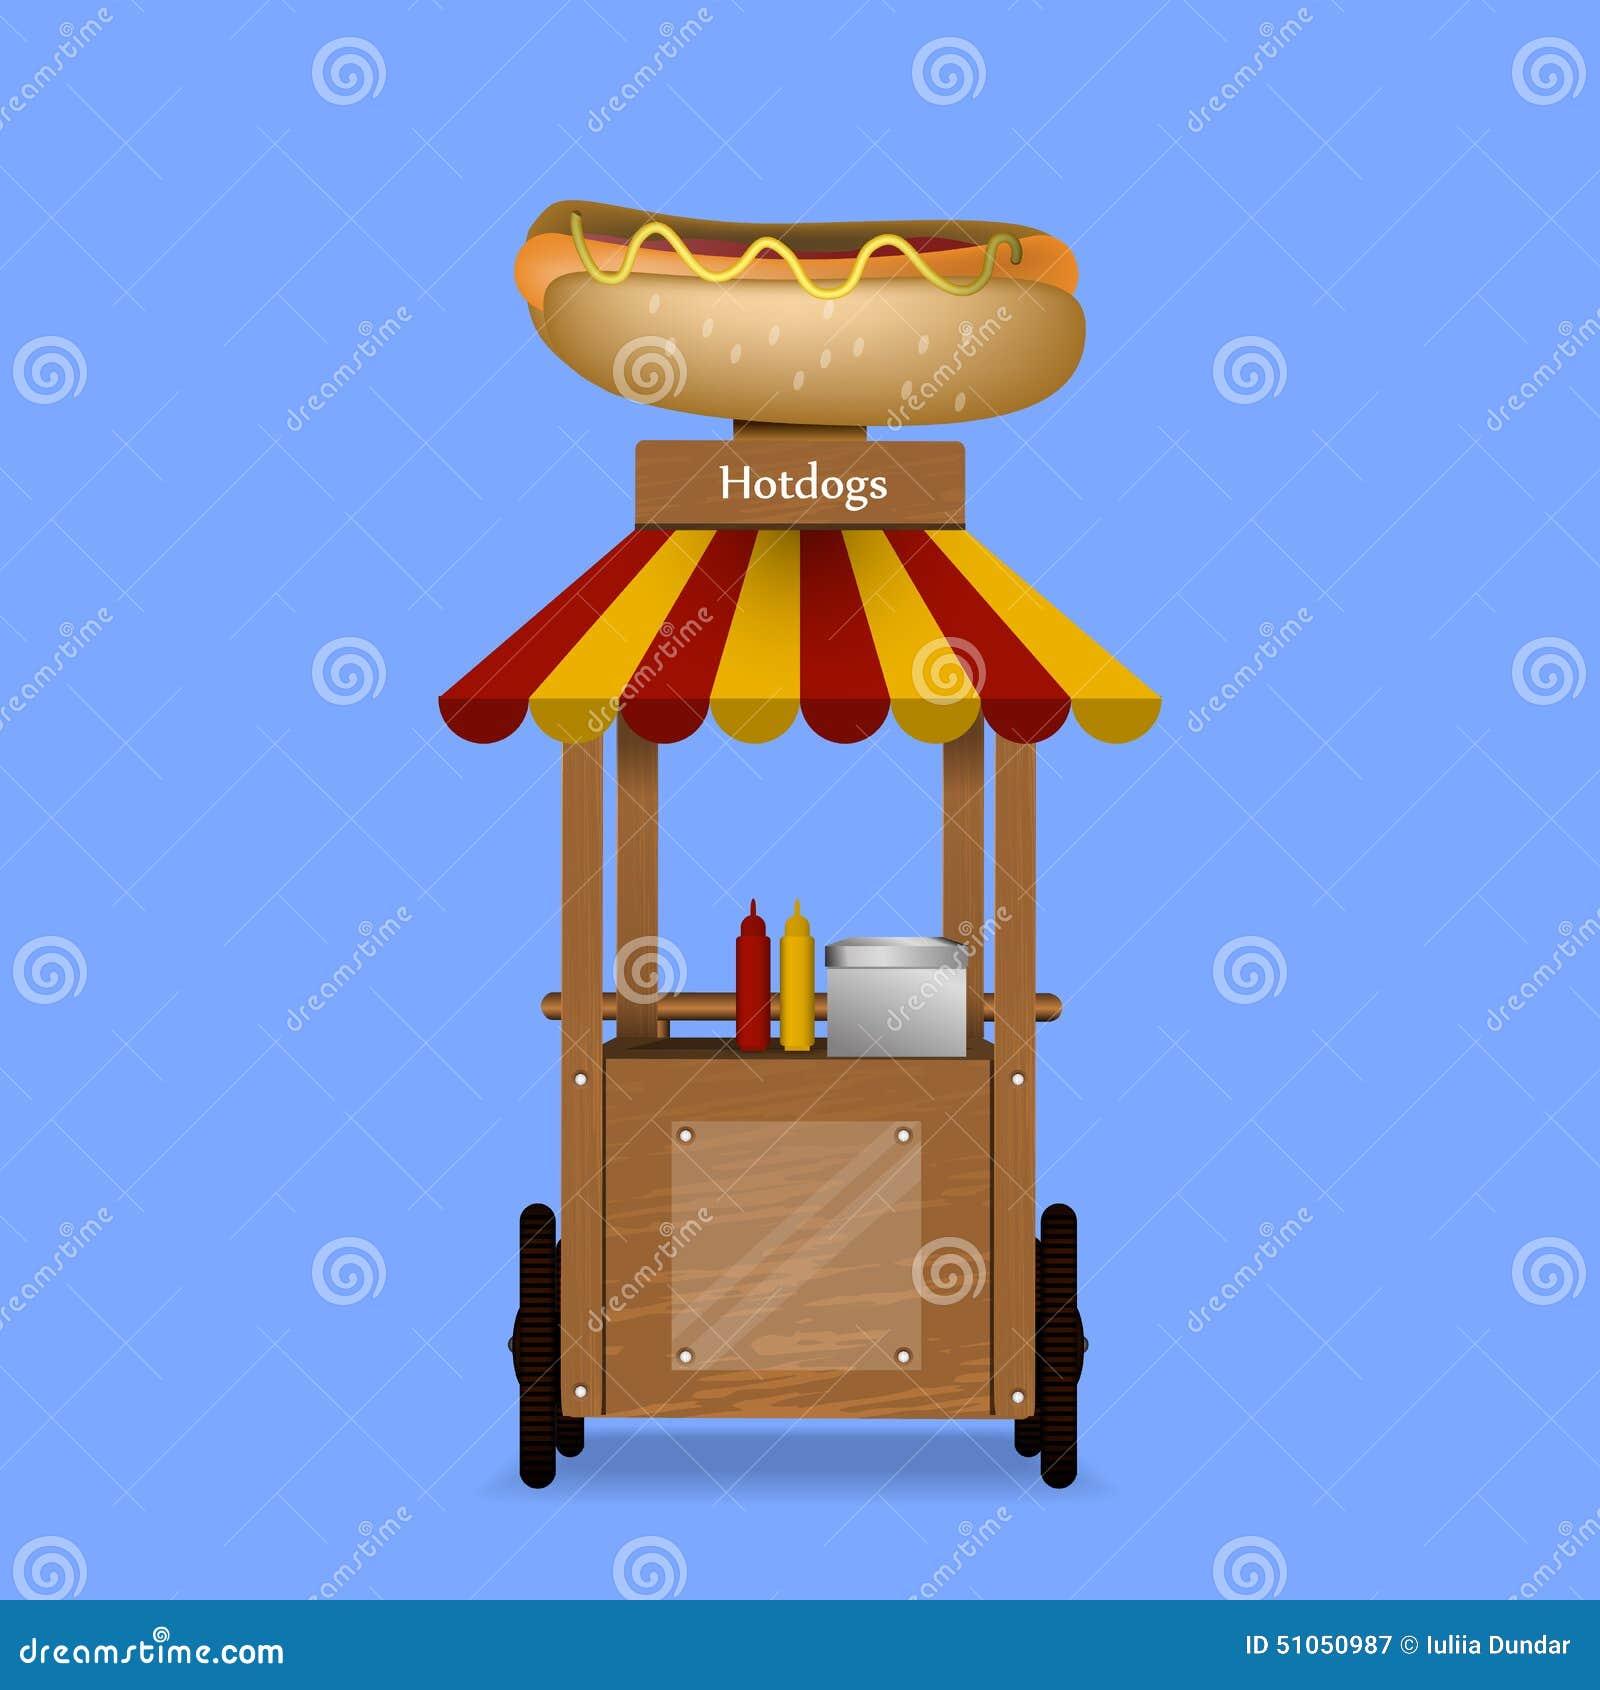 Hotdog stand business plan